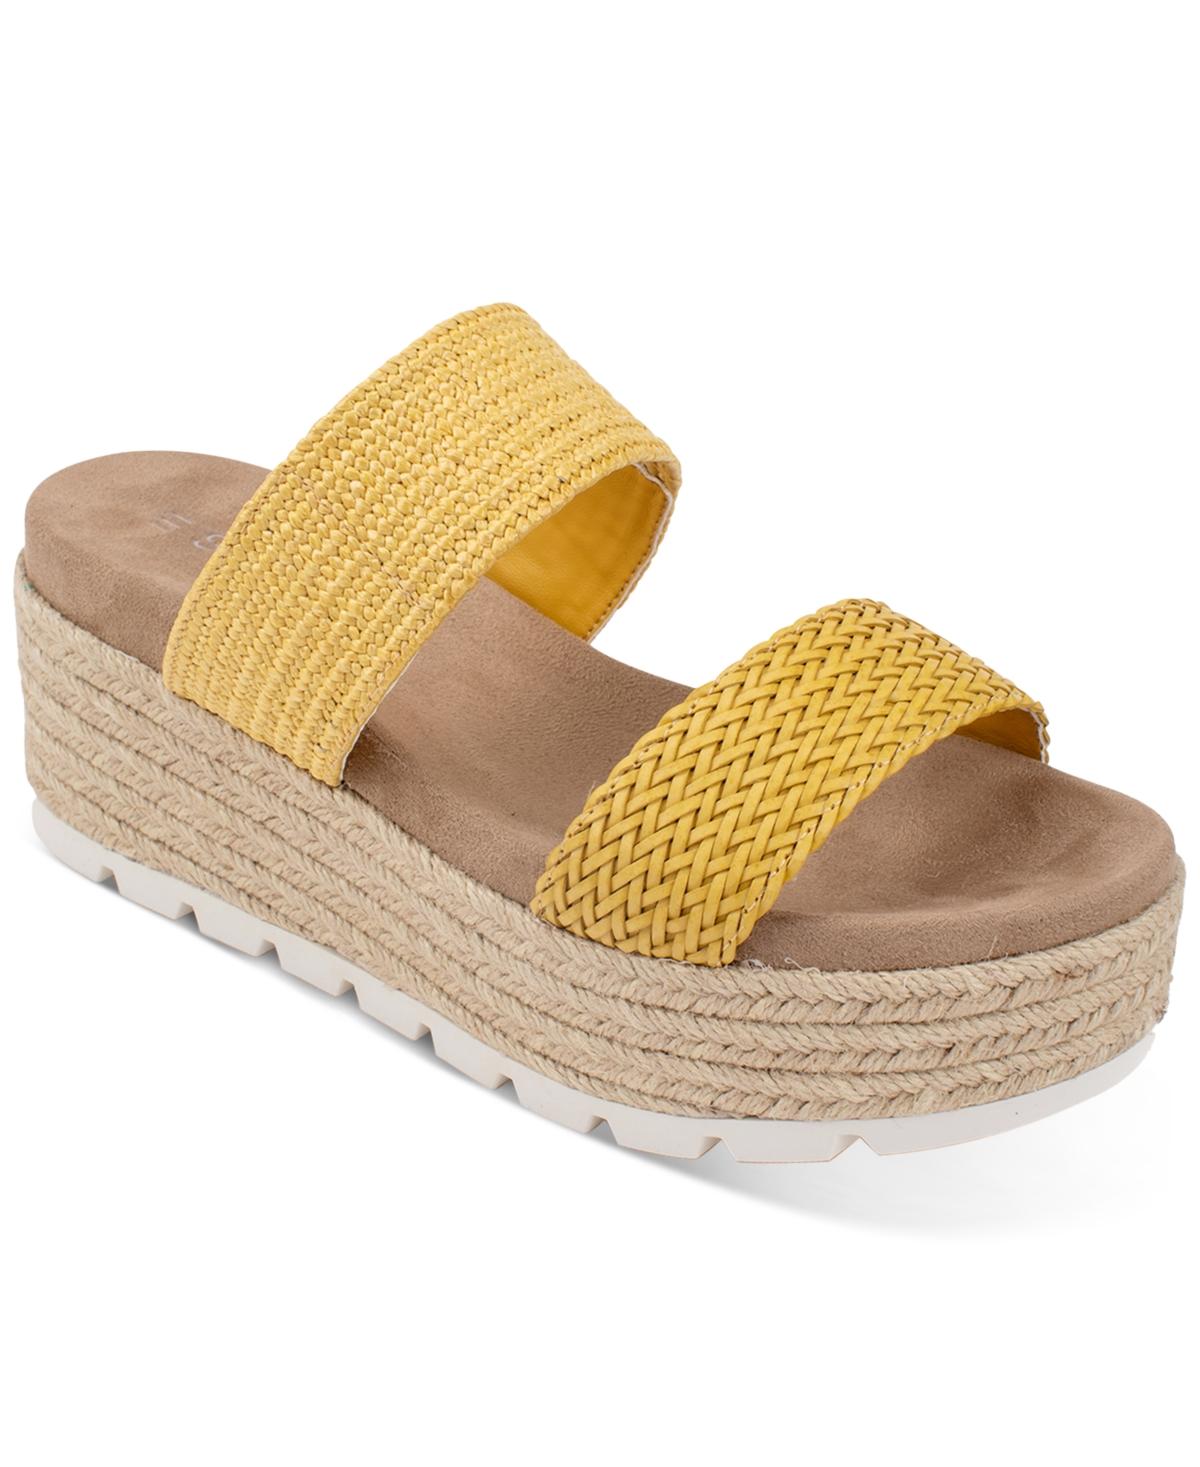 Esprit Aria Espadrille Flatform Sandals Women's Shoes